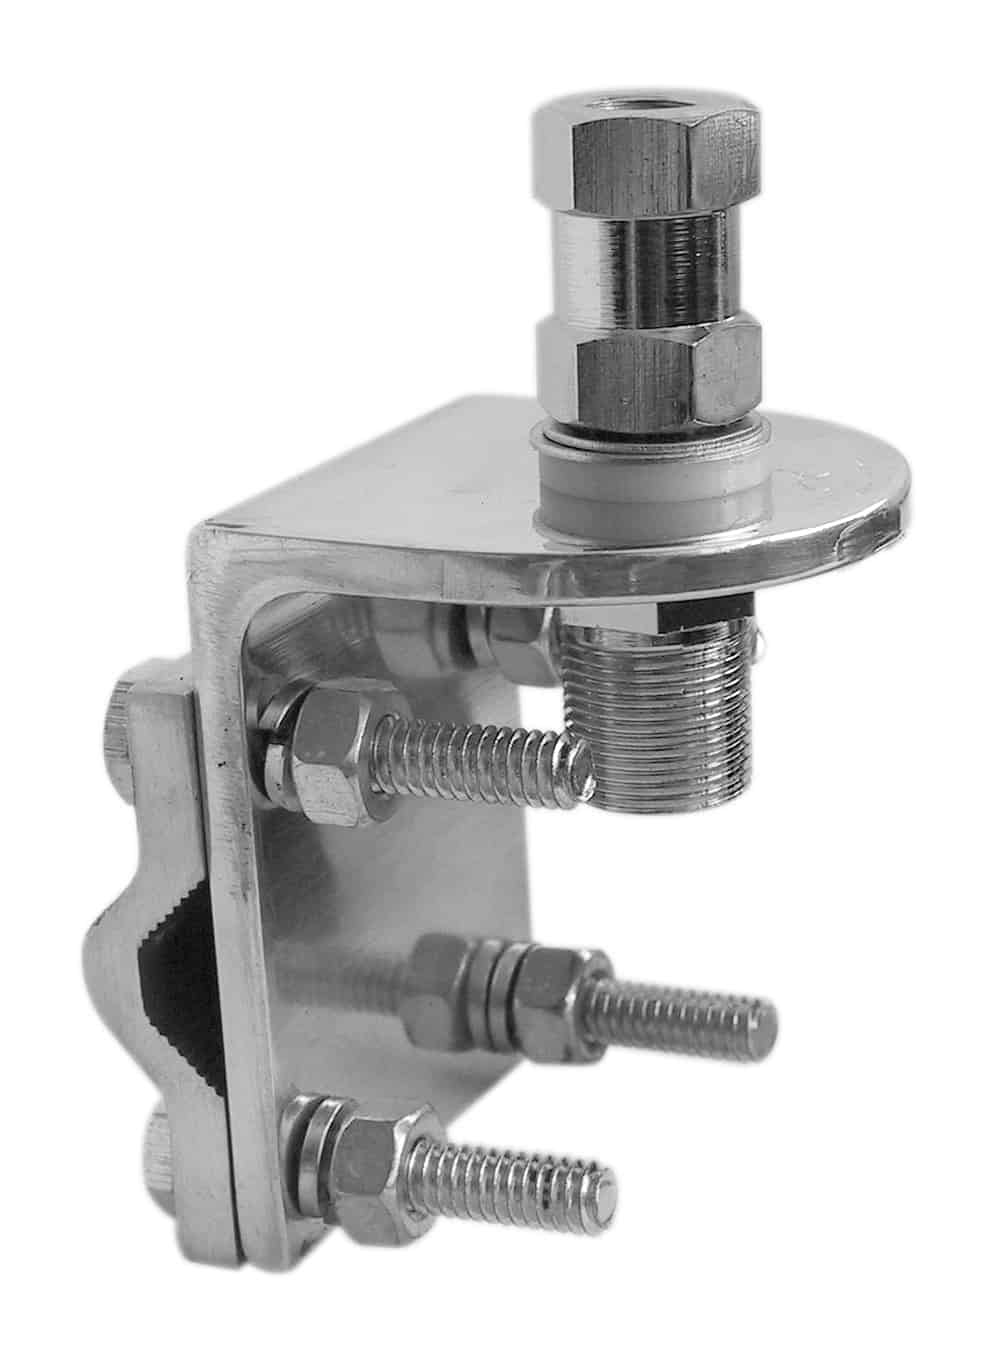 AUC3 - Accessories Unlimited 3 Way Aluminum Mirror Mount